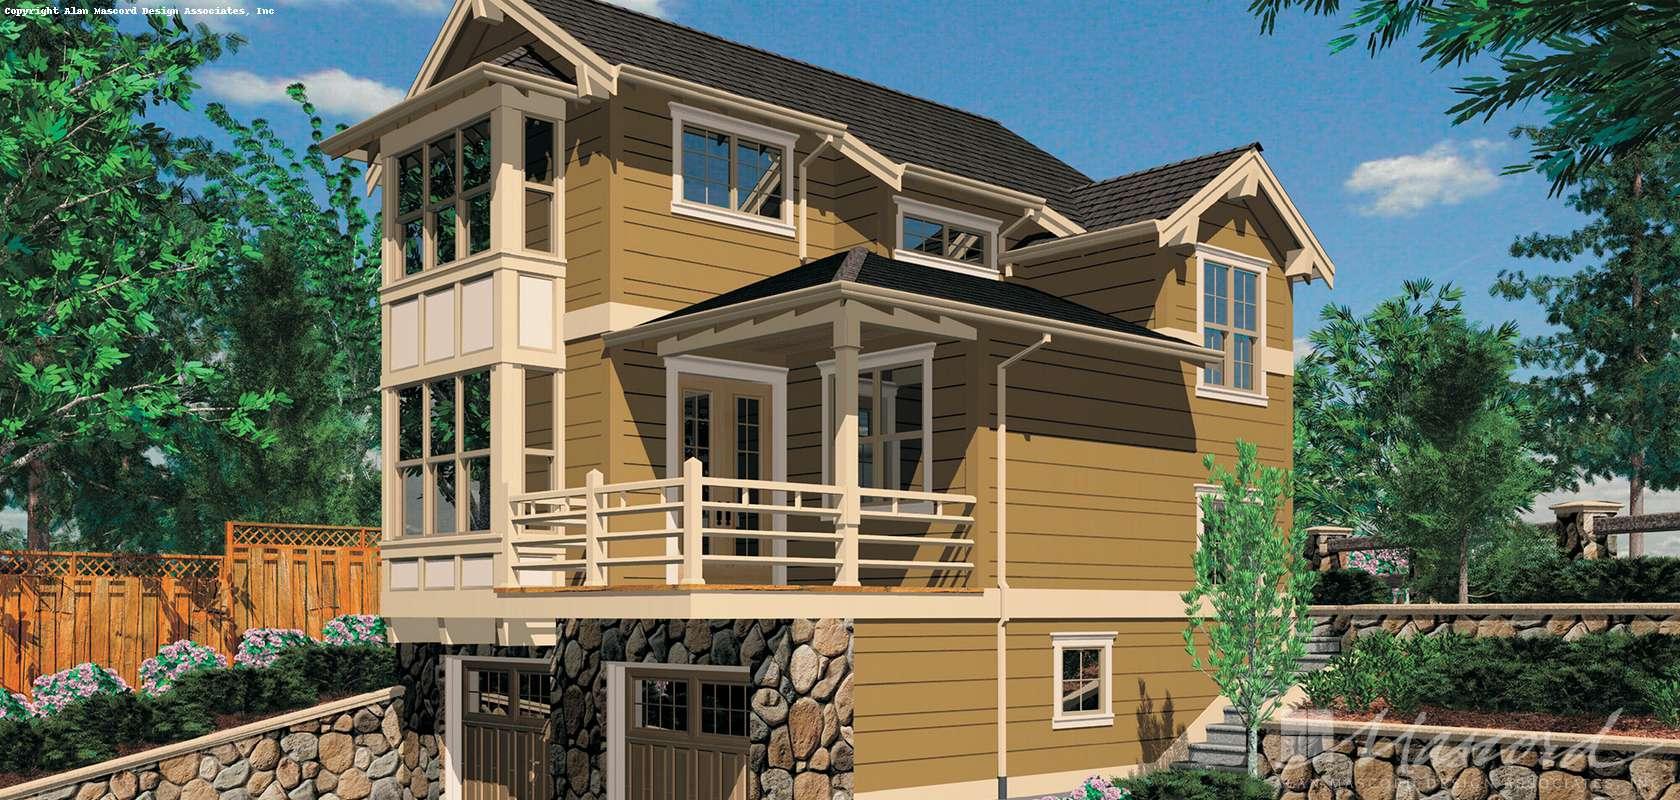 Mascord House Plan 5020: The Merillat